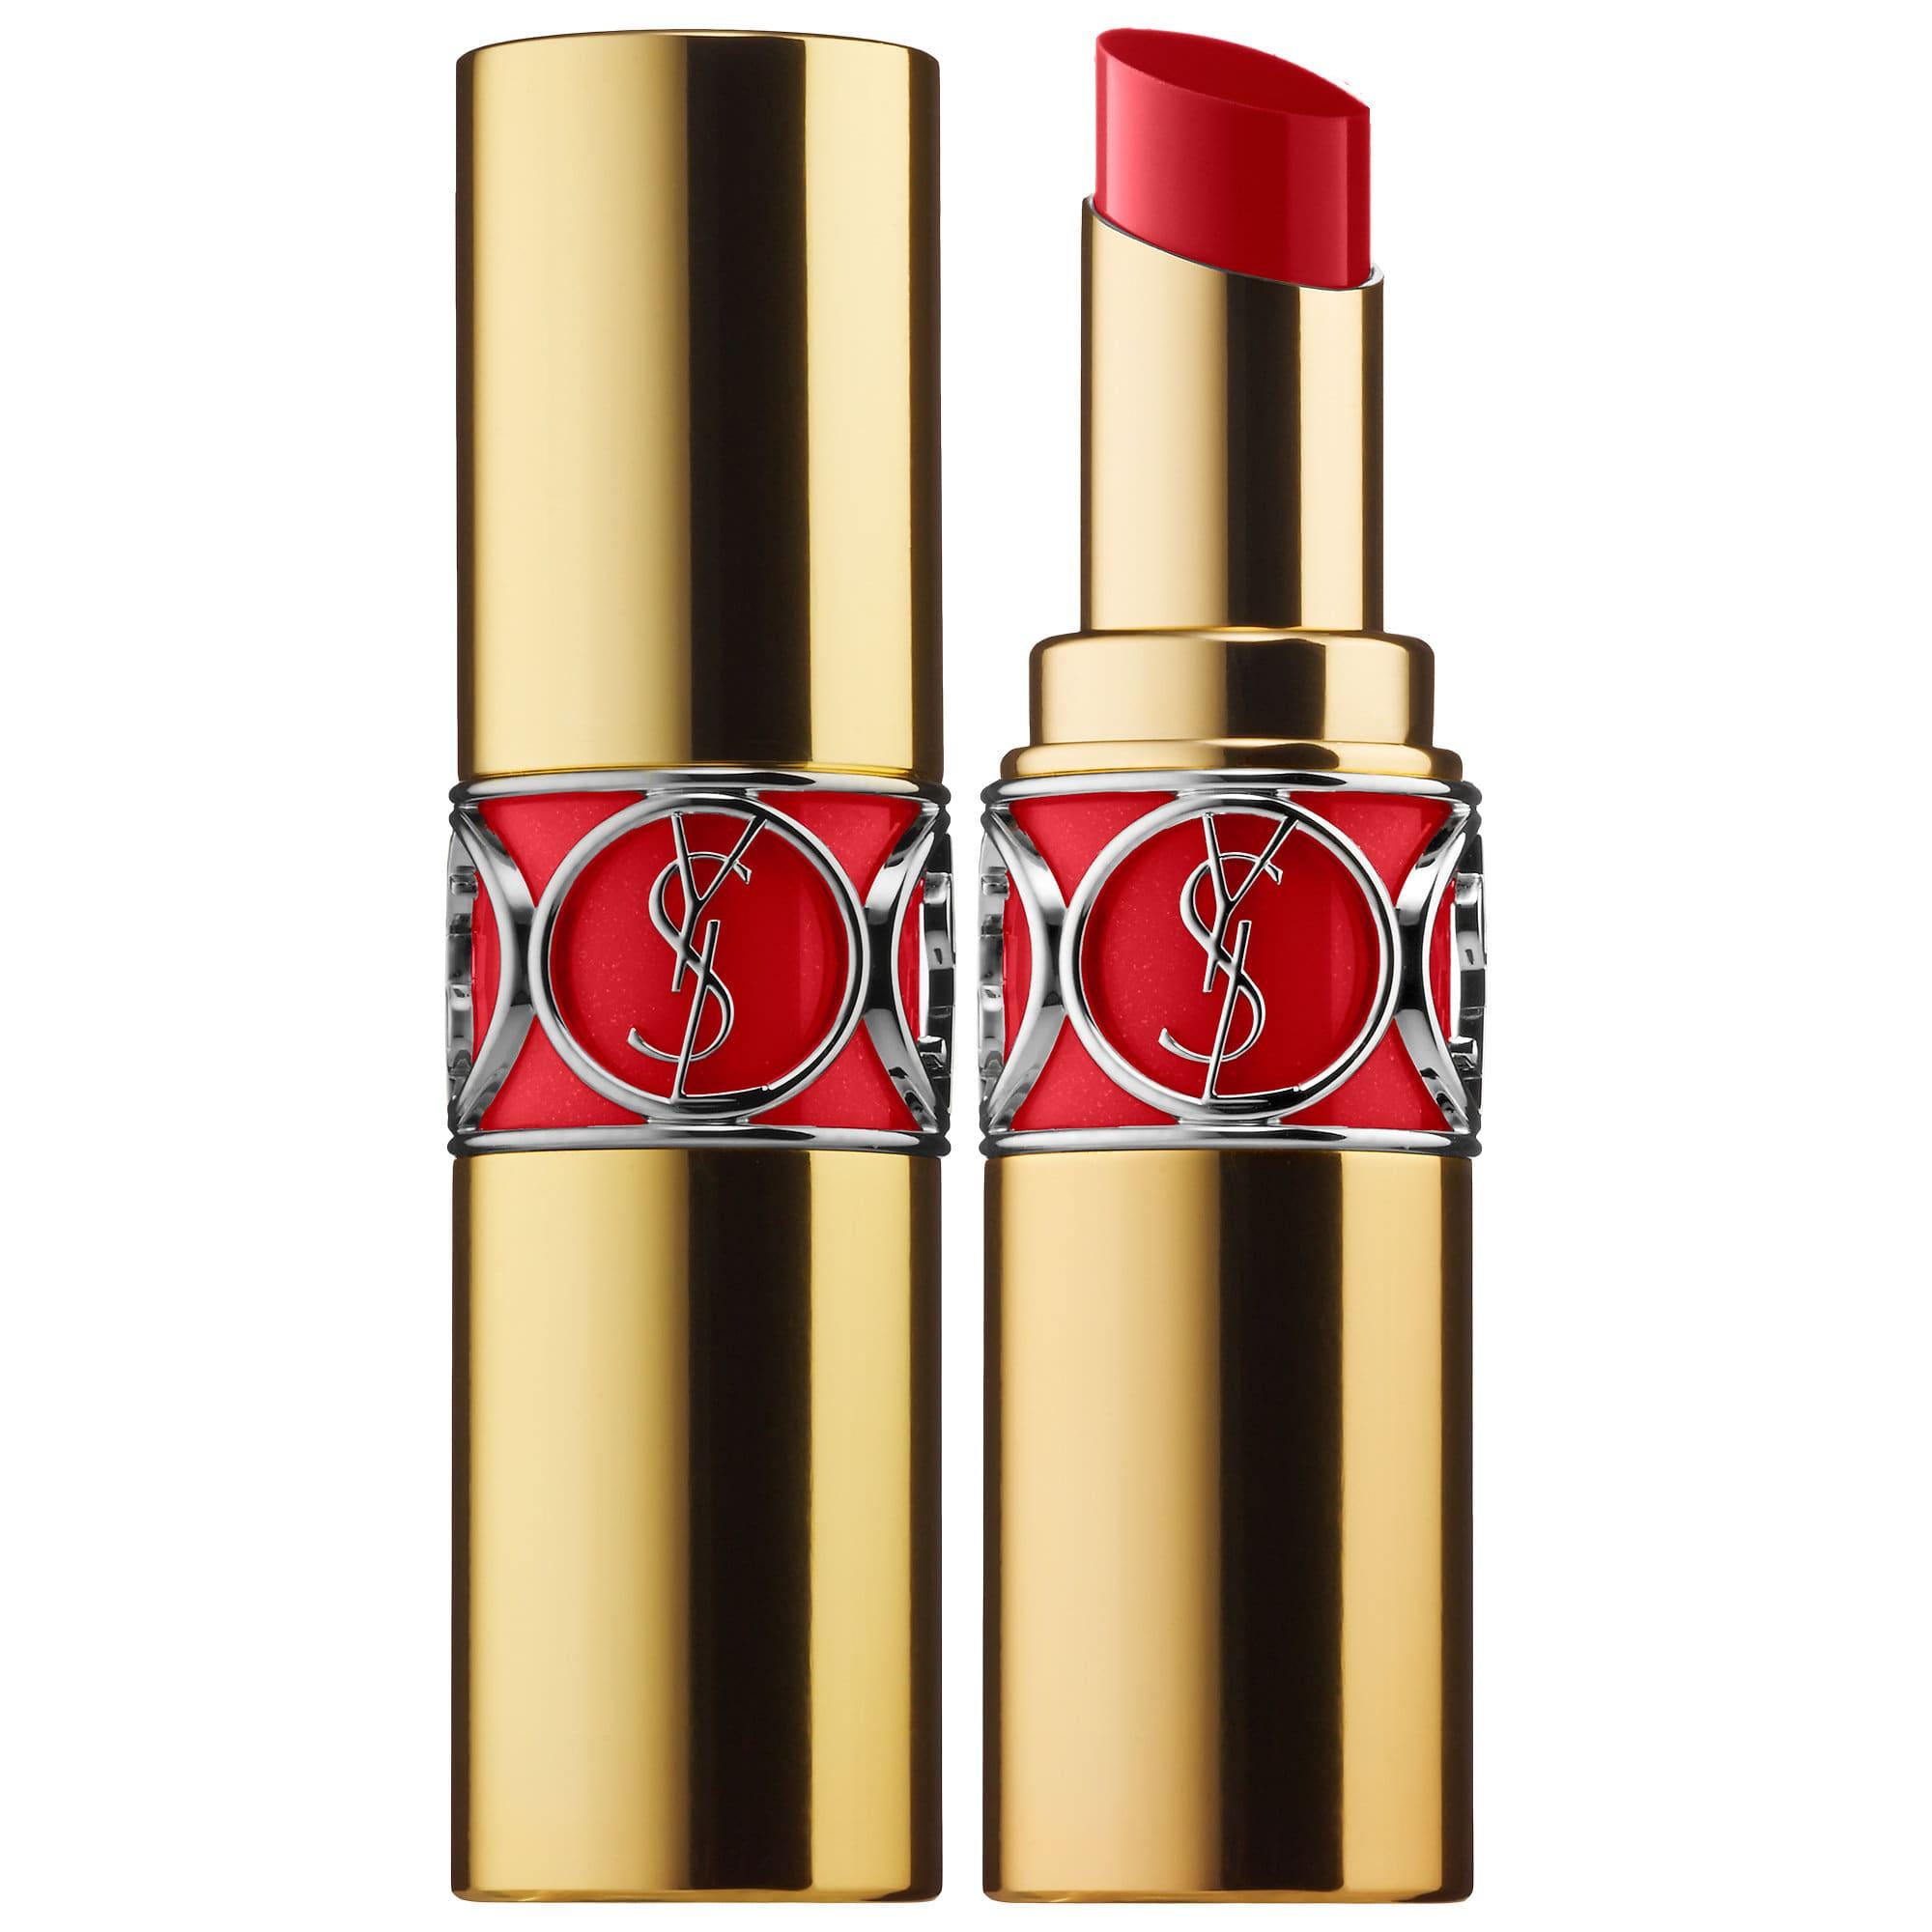 Rouge Volupté Shine OilInStick Lipstick Lipstick, Ysl